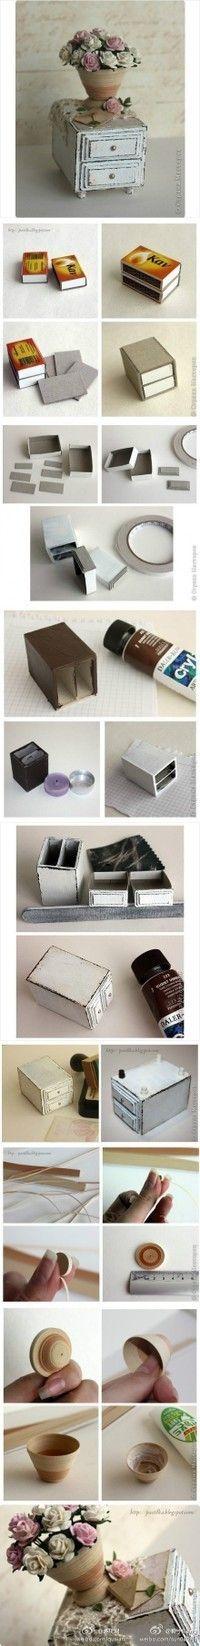 match box DIY - zzkko.com